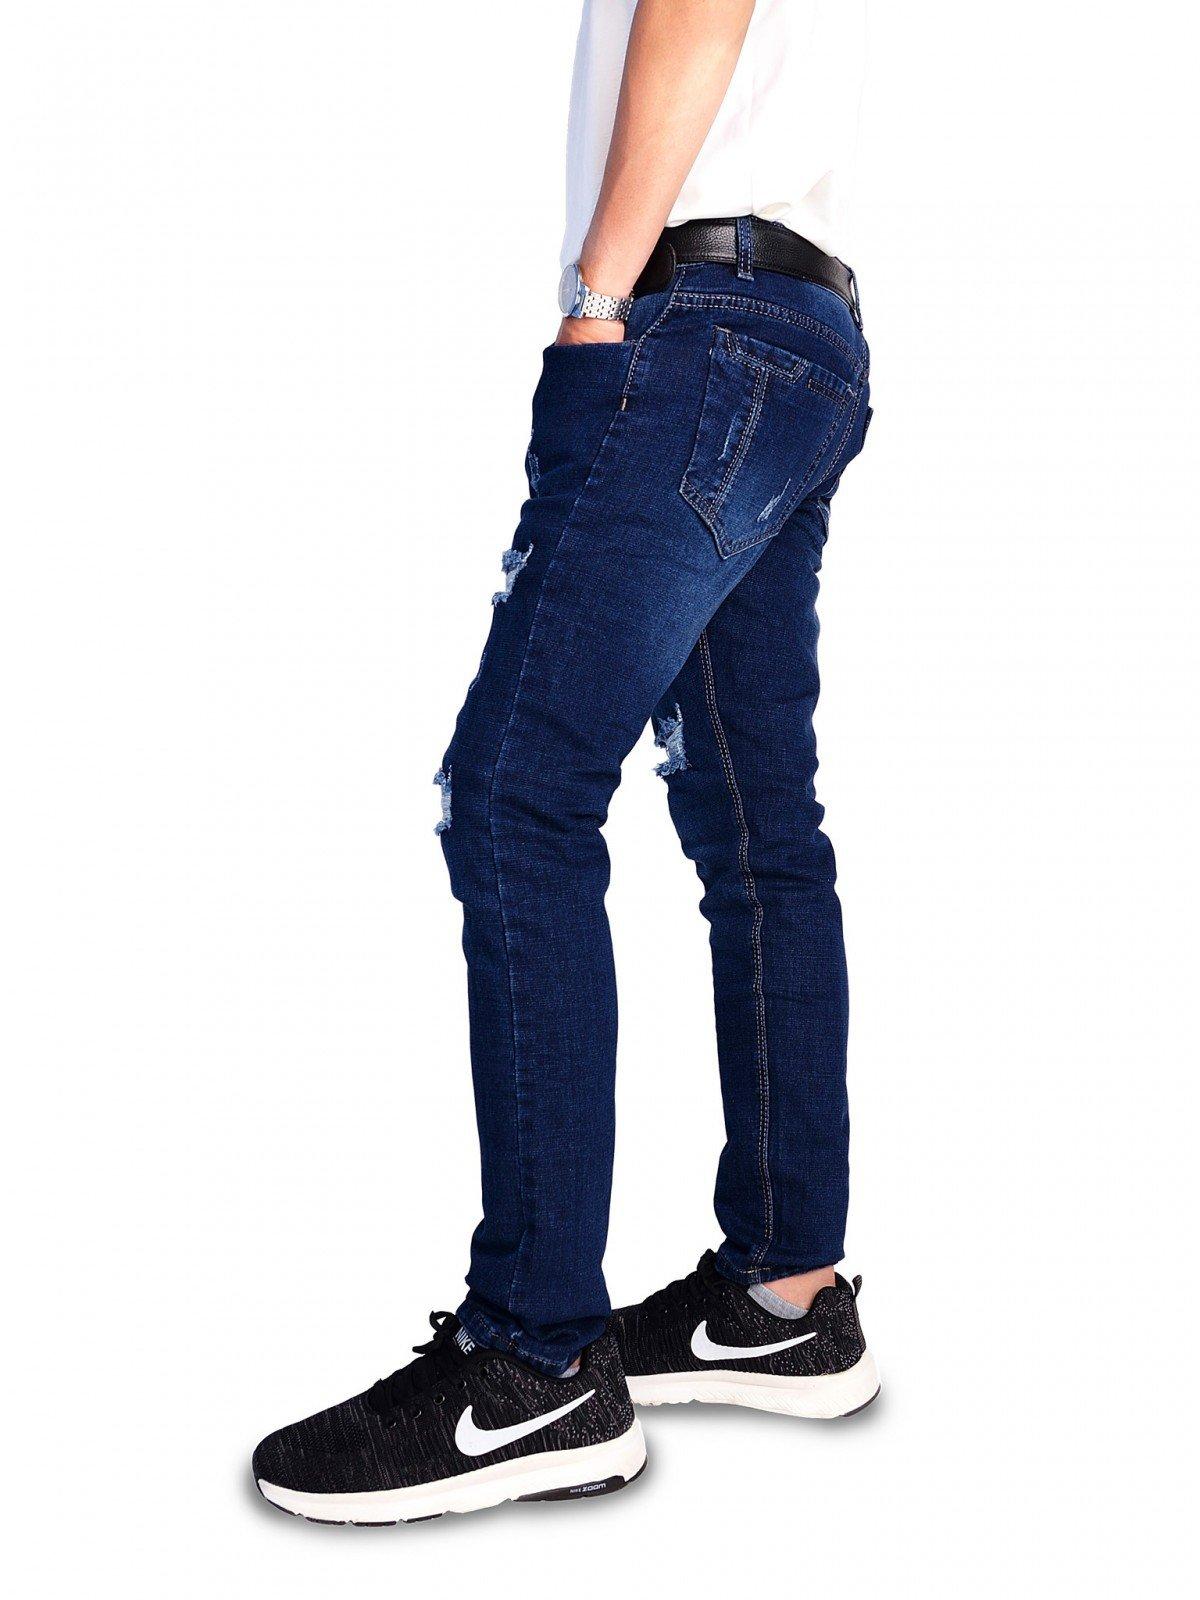 Quan Jeans nam rach goi